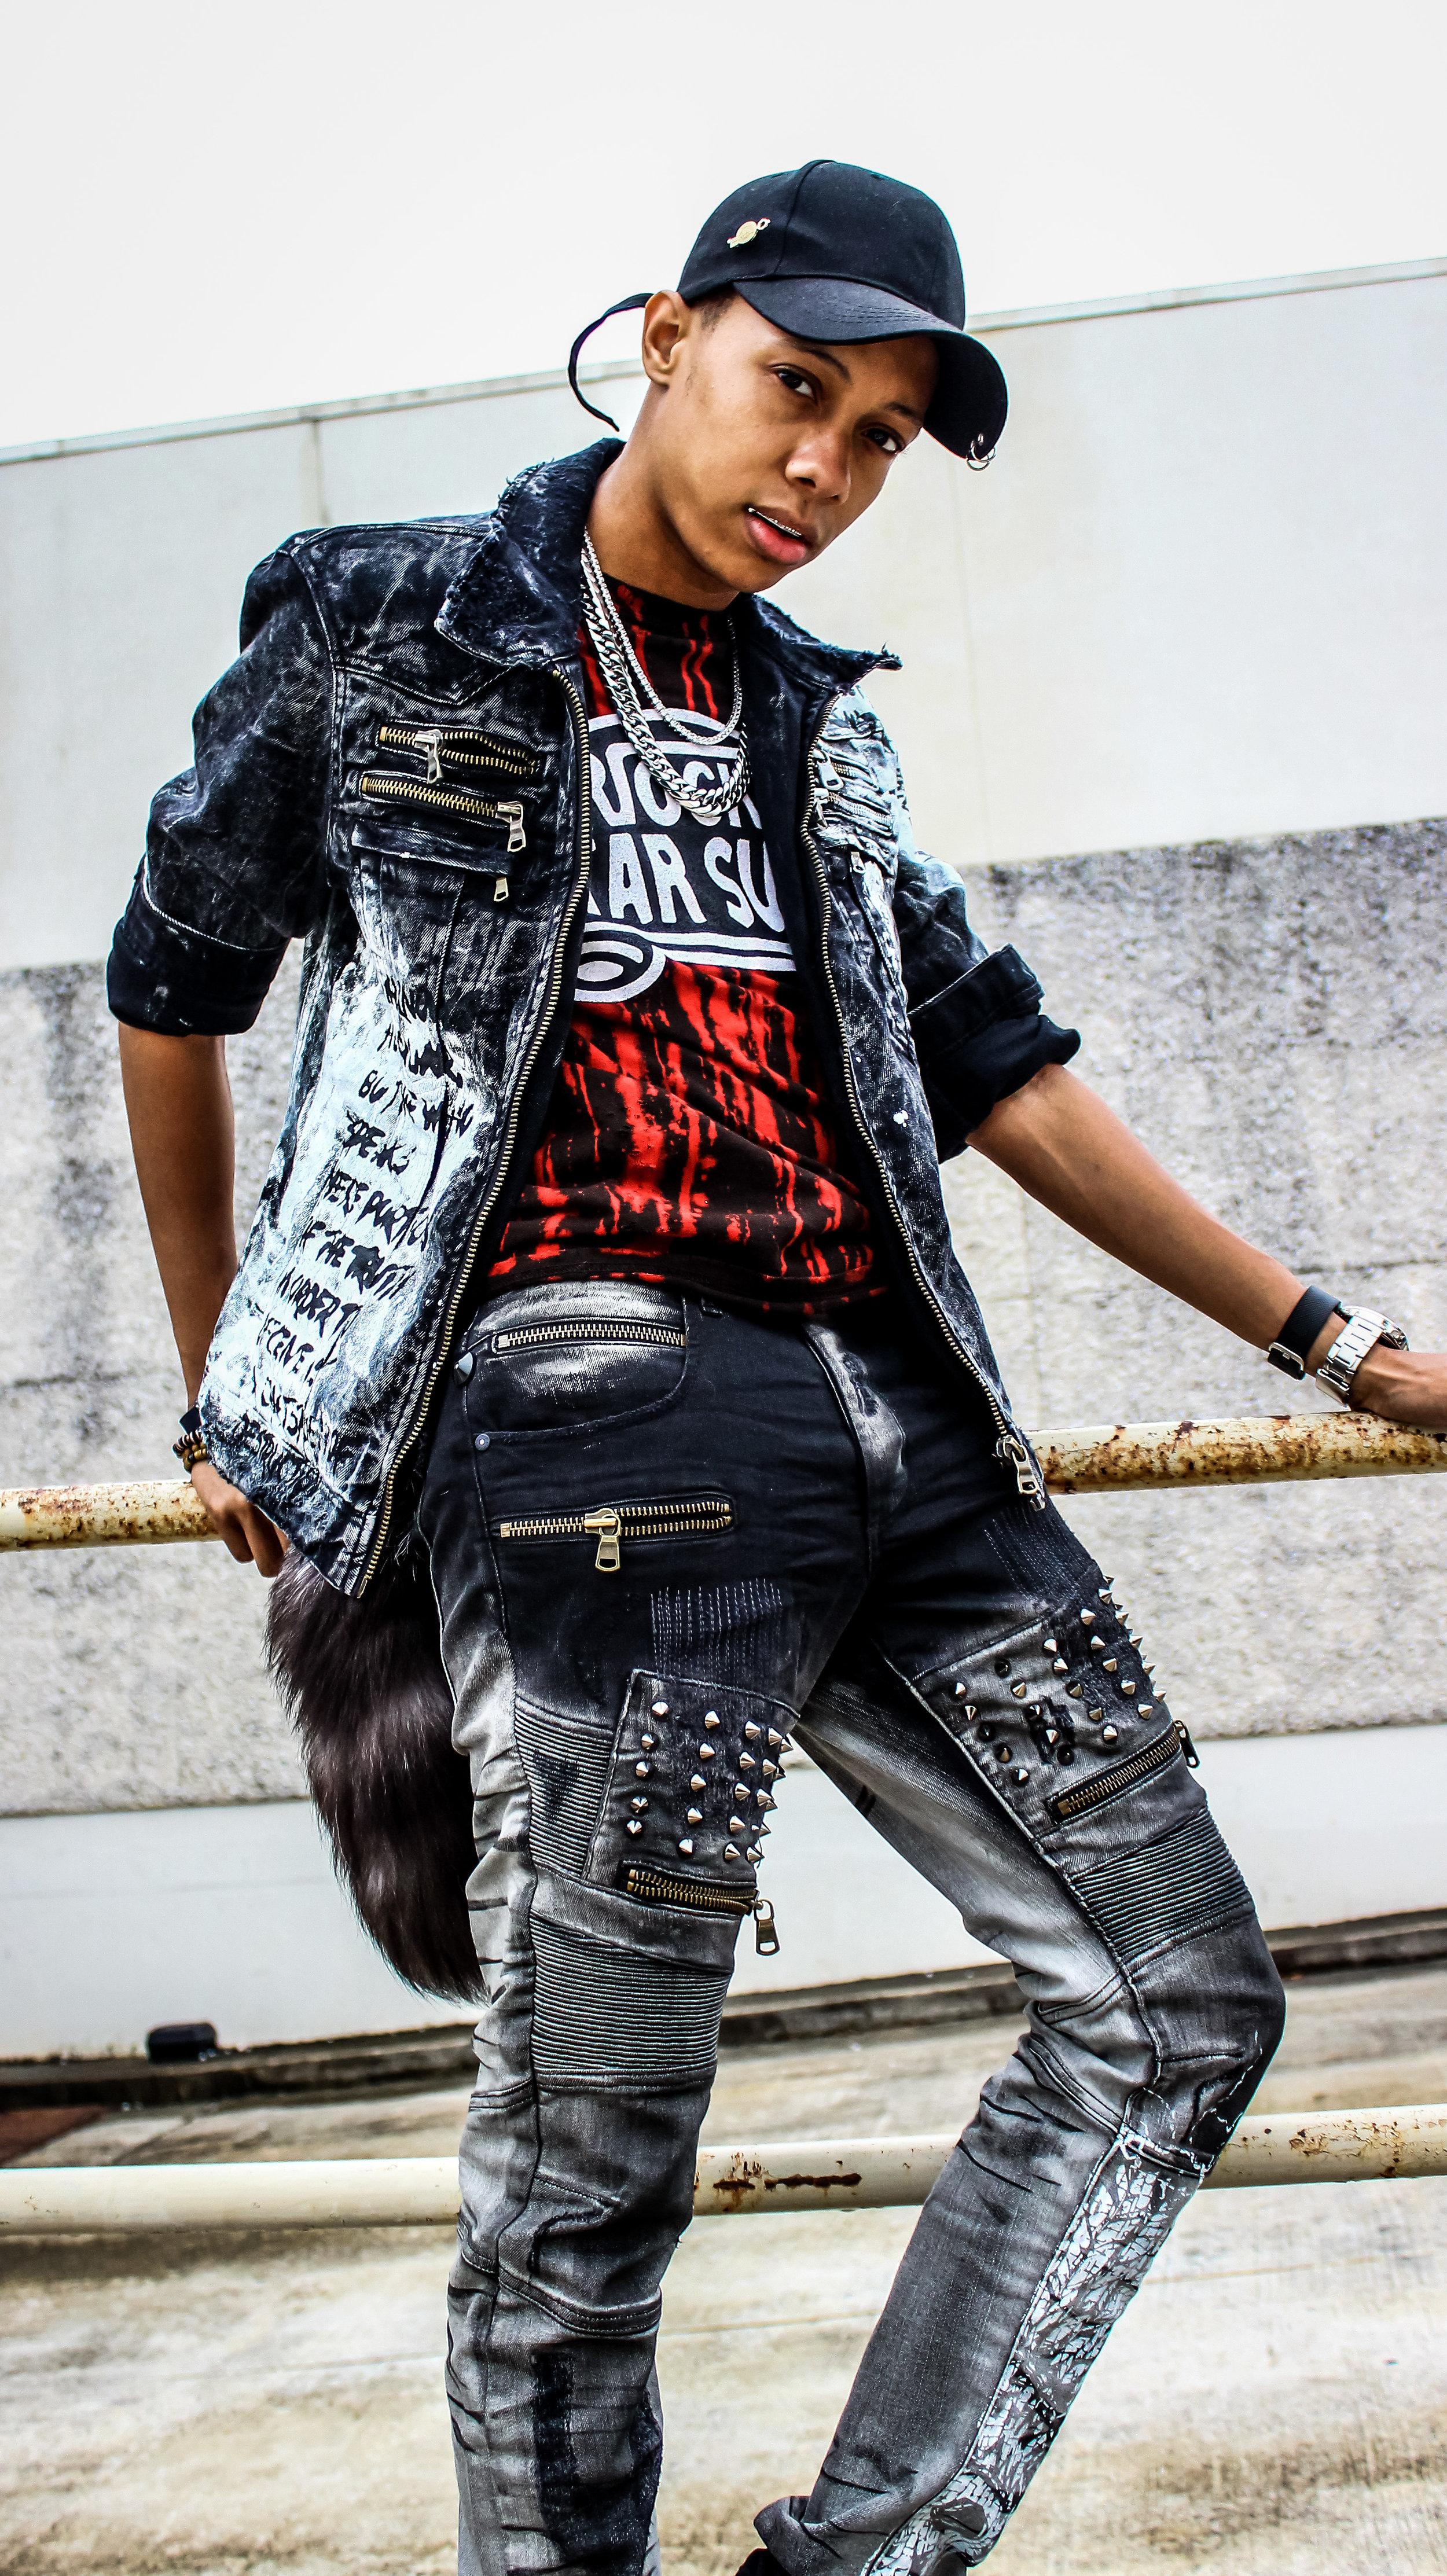 MK rockstar 11.jpg